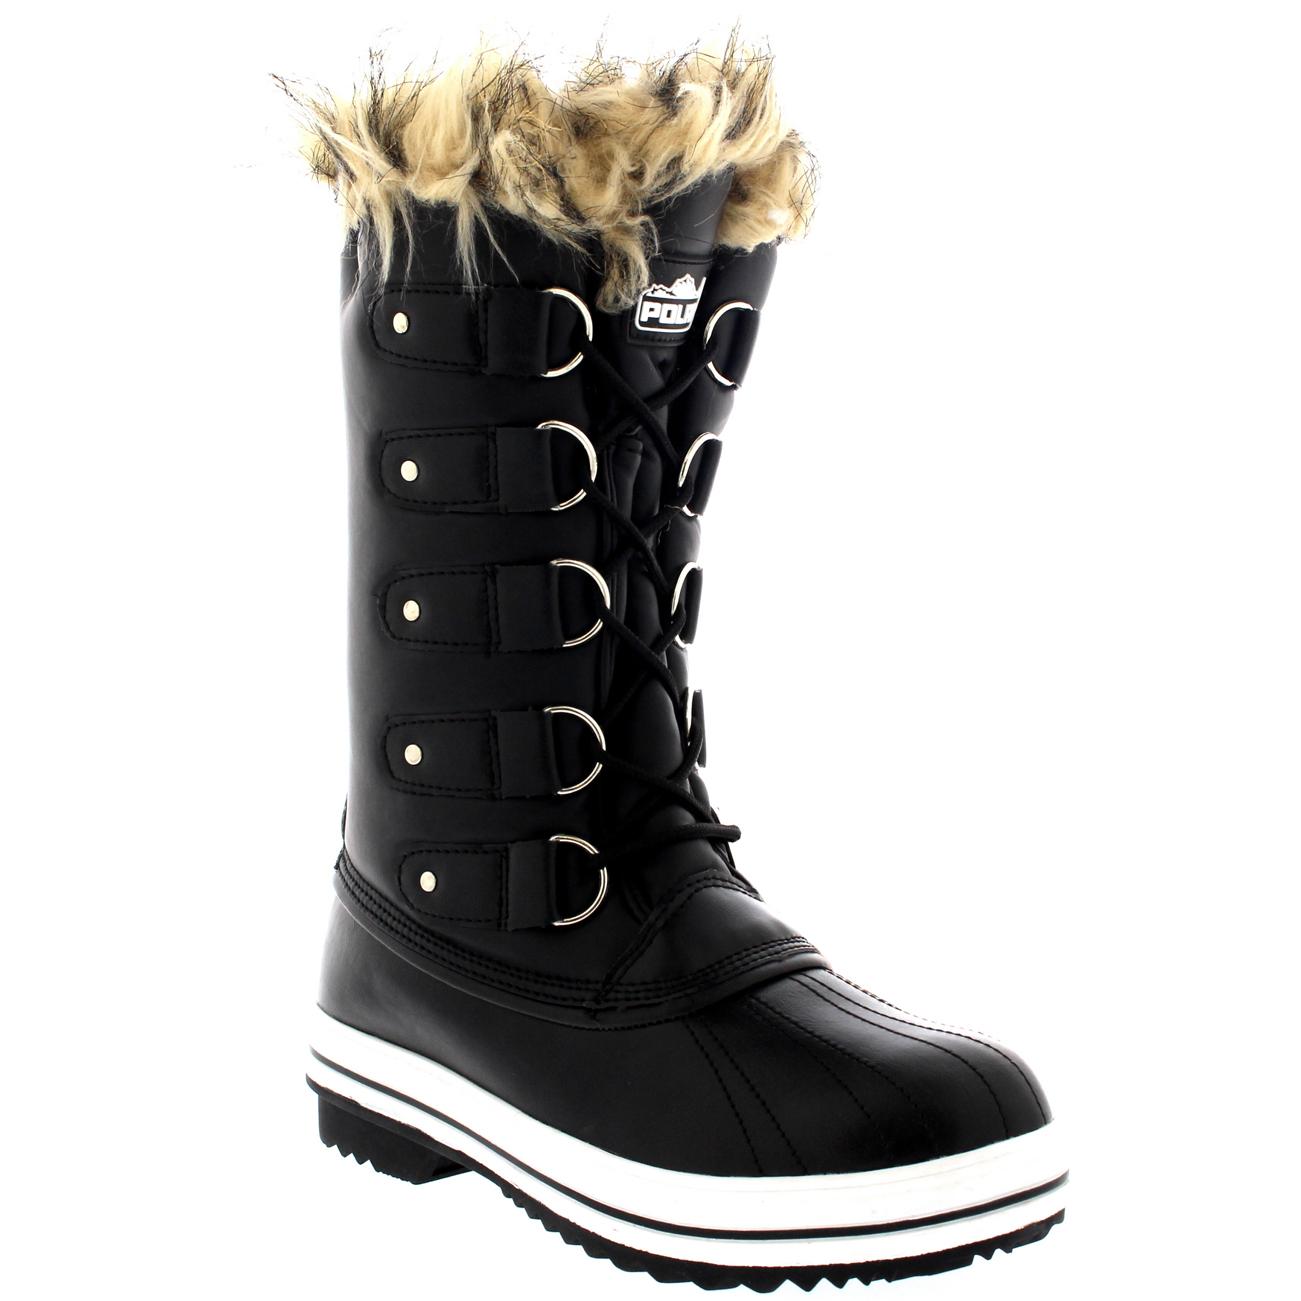 Womens Fur Cuff Lace Up Rubber Sole Tall Winter Snow Rain ...